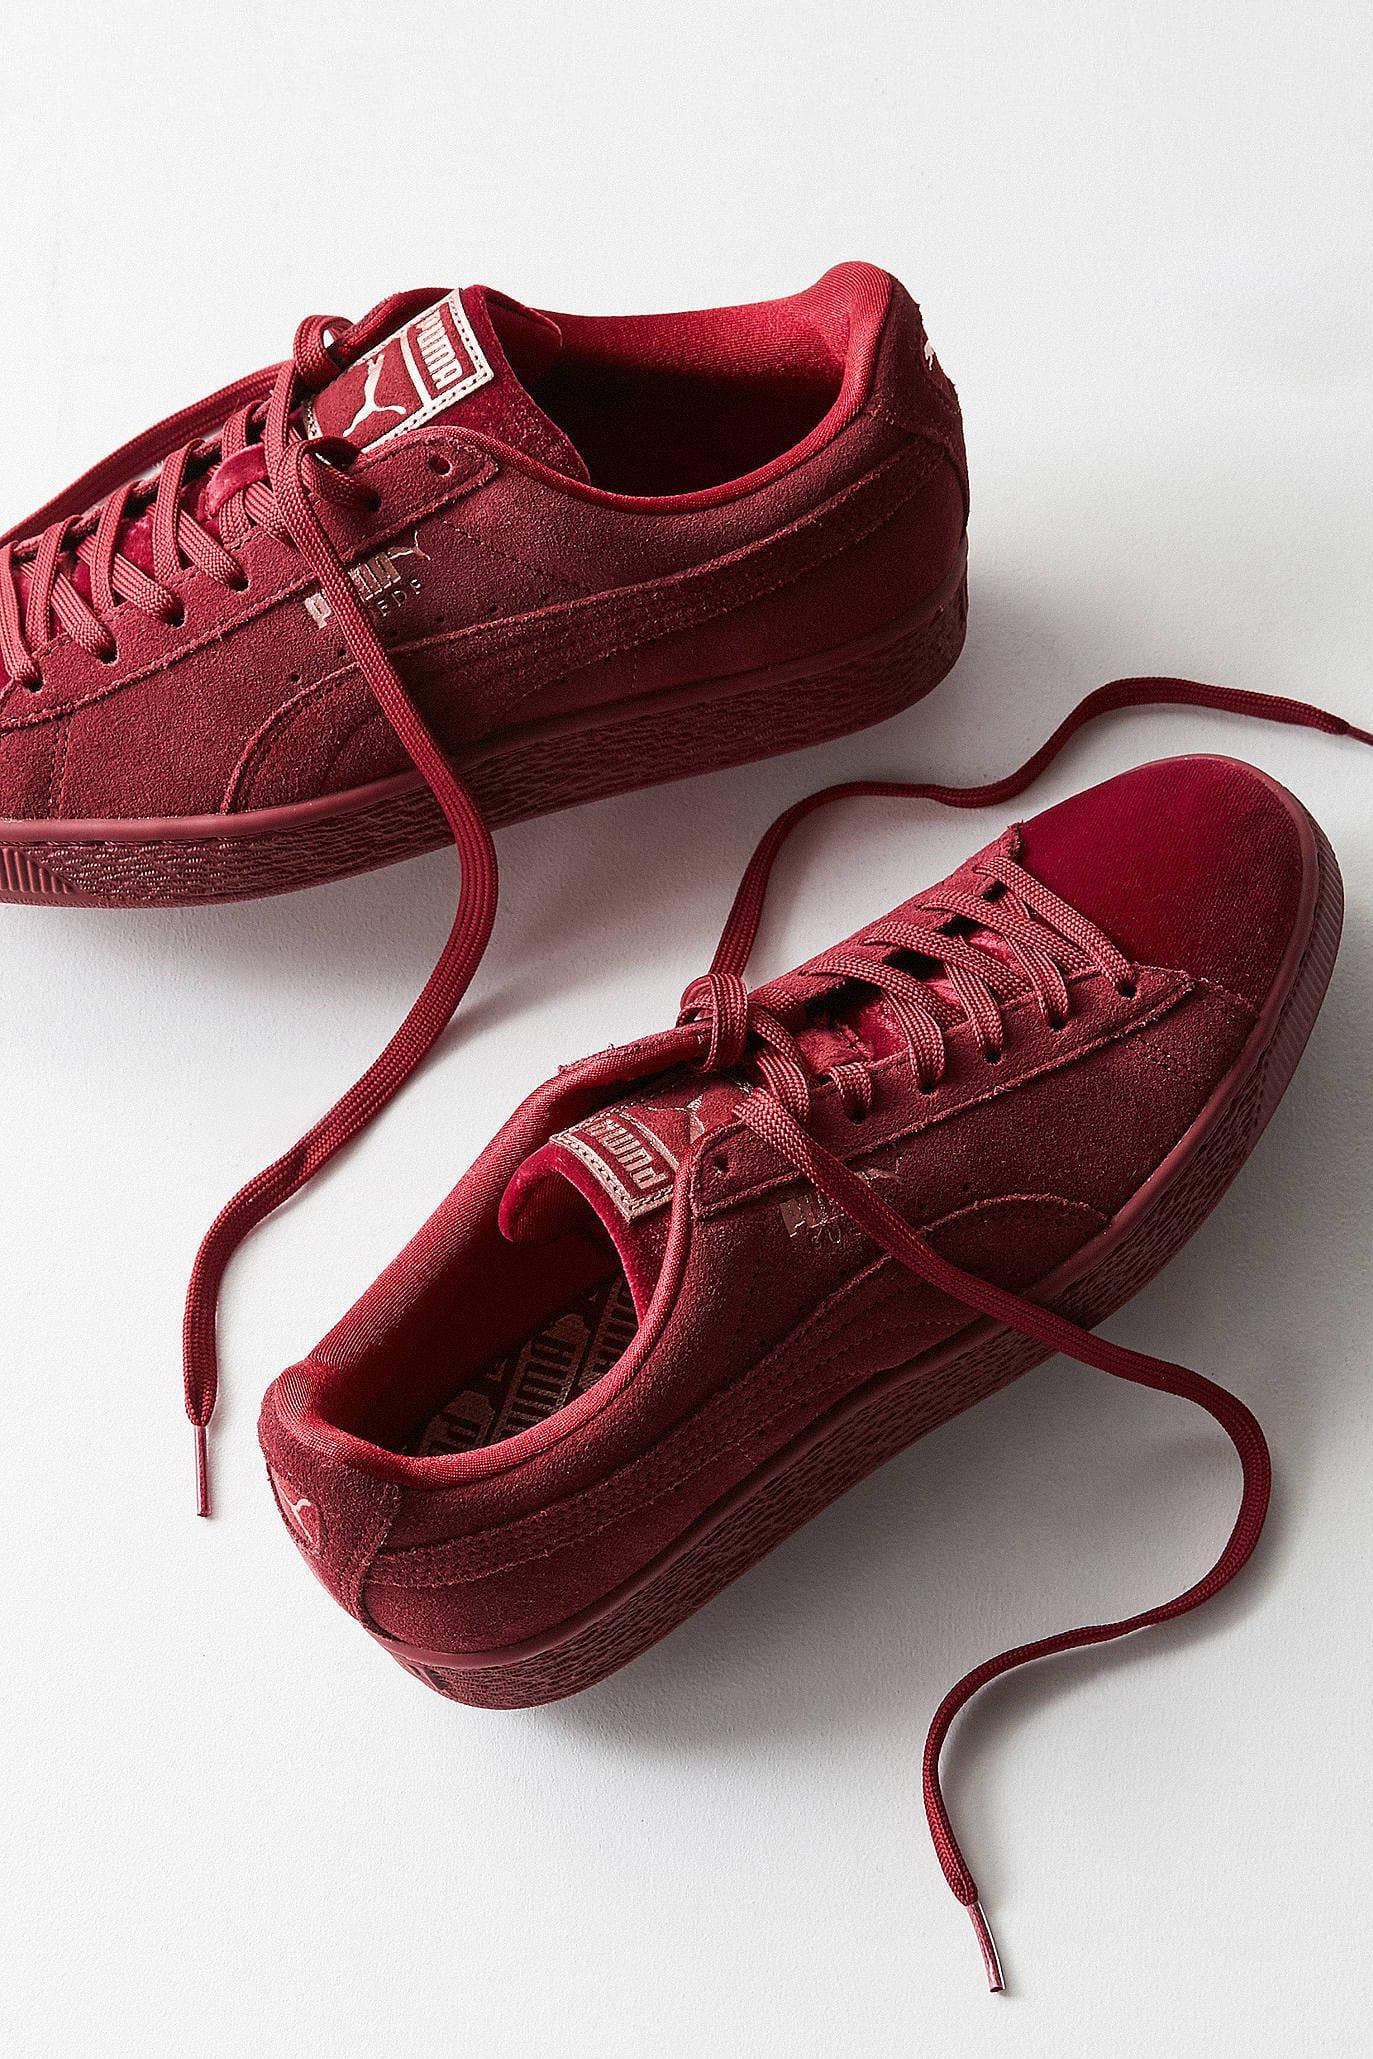 Suede Classic Velvet in Maroon Red